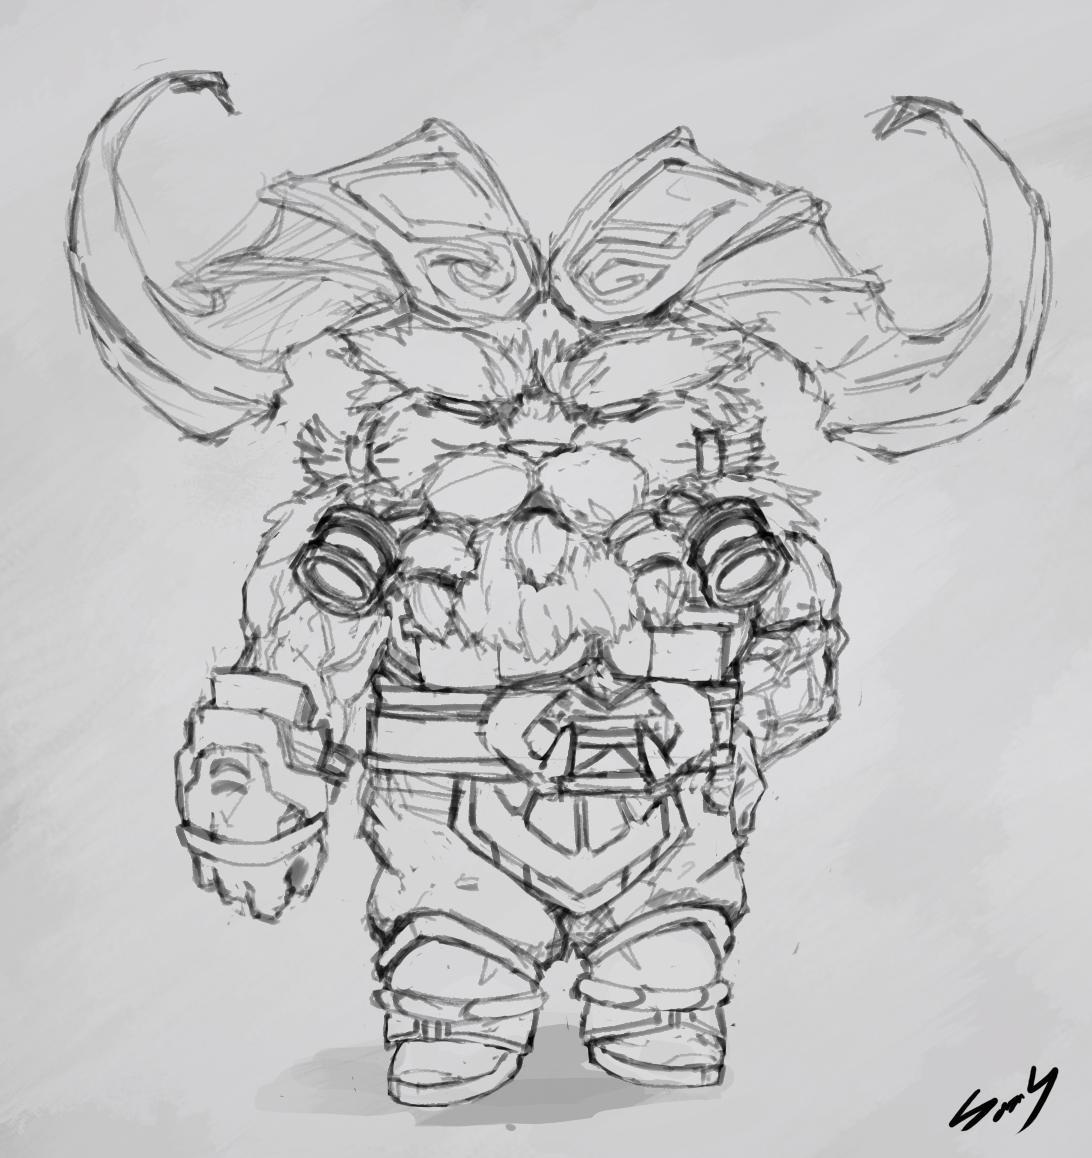 Yornndle Ornn Sketch League Of Legends By Seldroy On Deviantart Drawing unicorn cartoon sketch, unicornio, unicorn illustration png clipart. yornndle ornn sketch league of